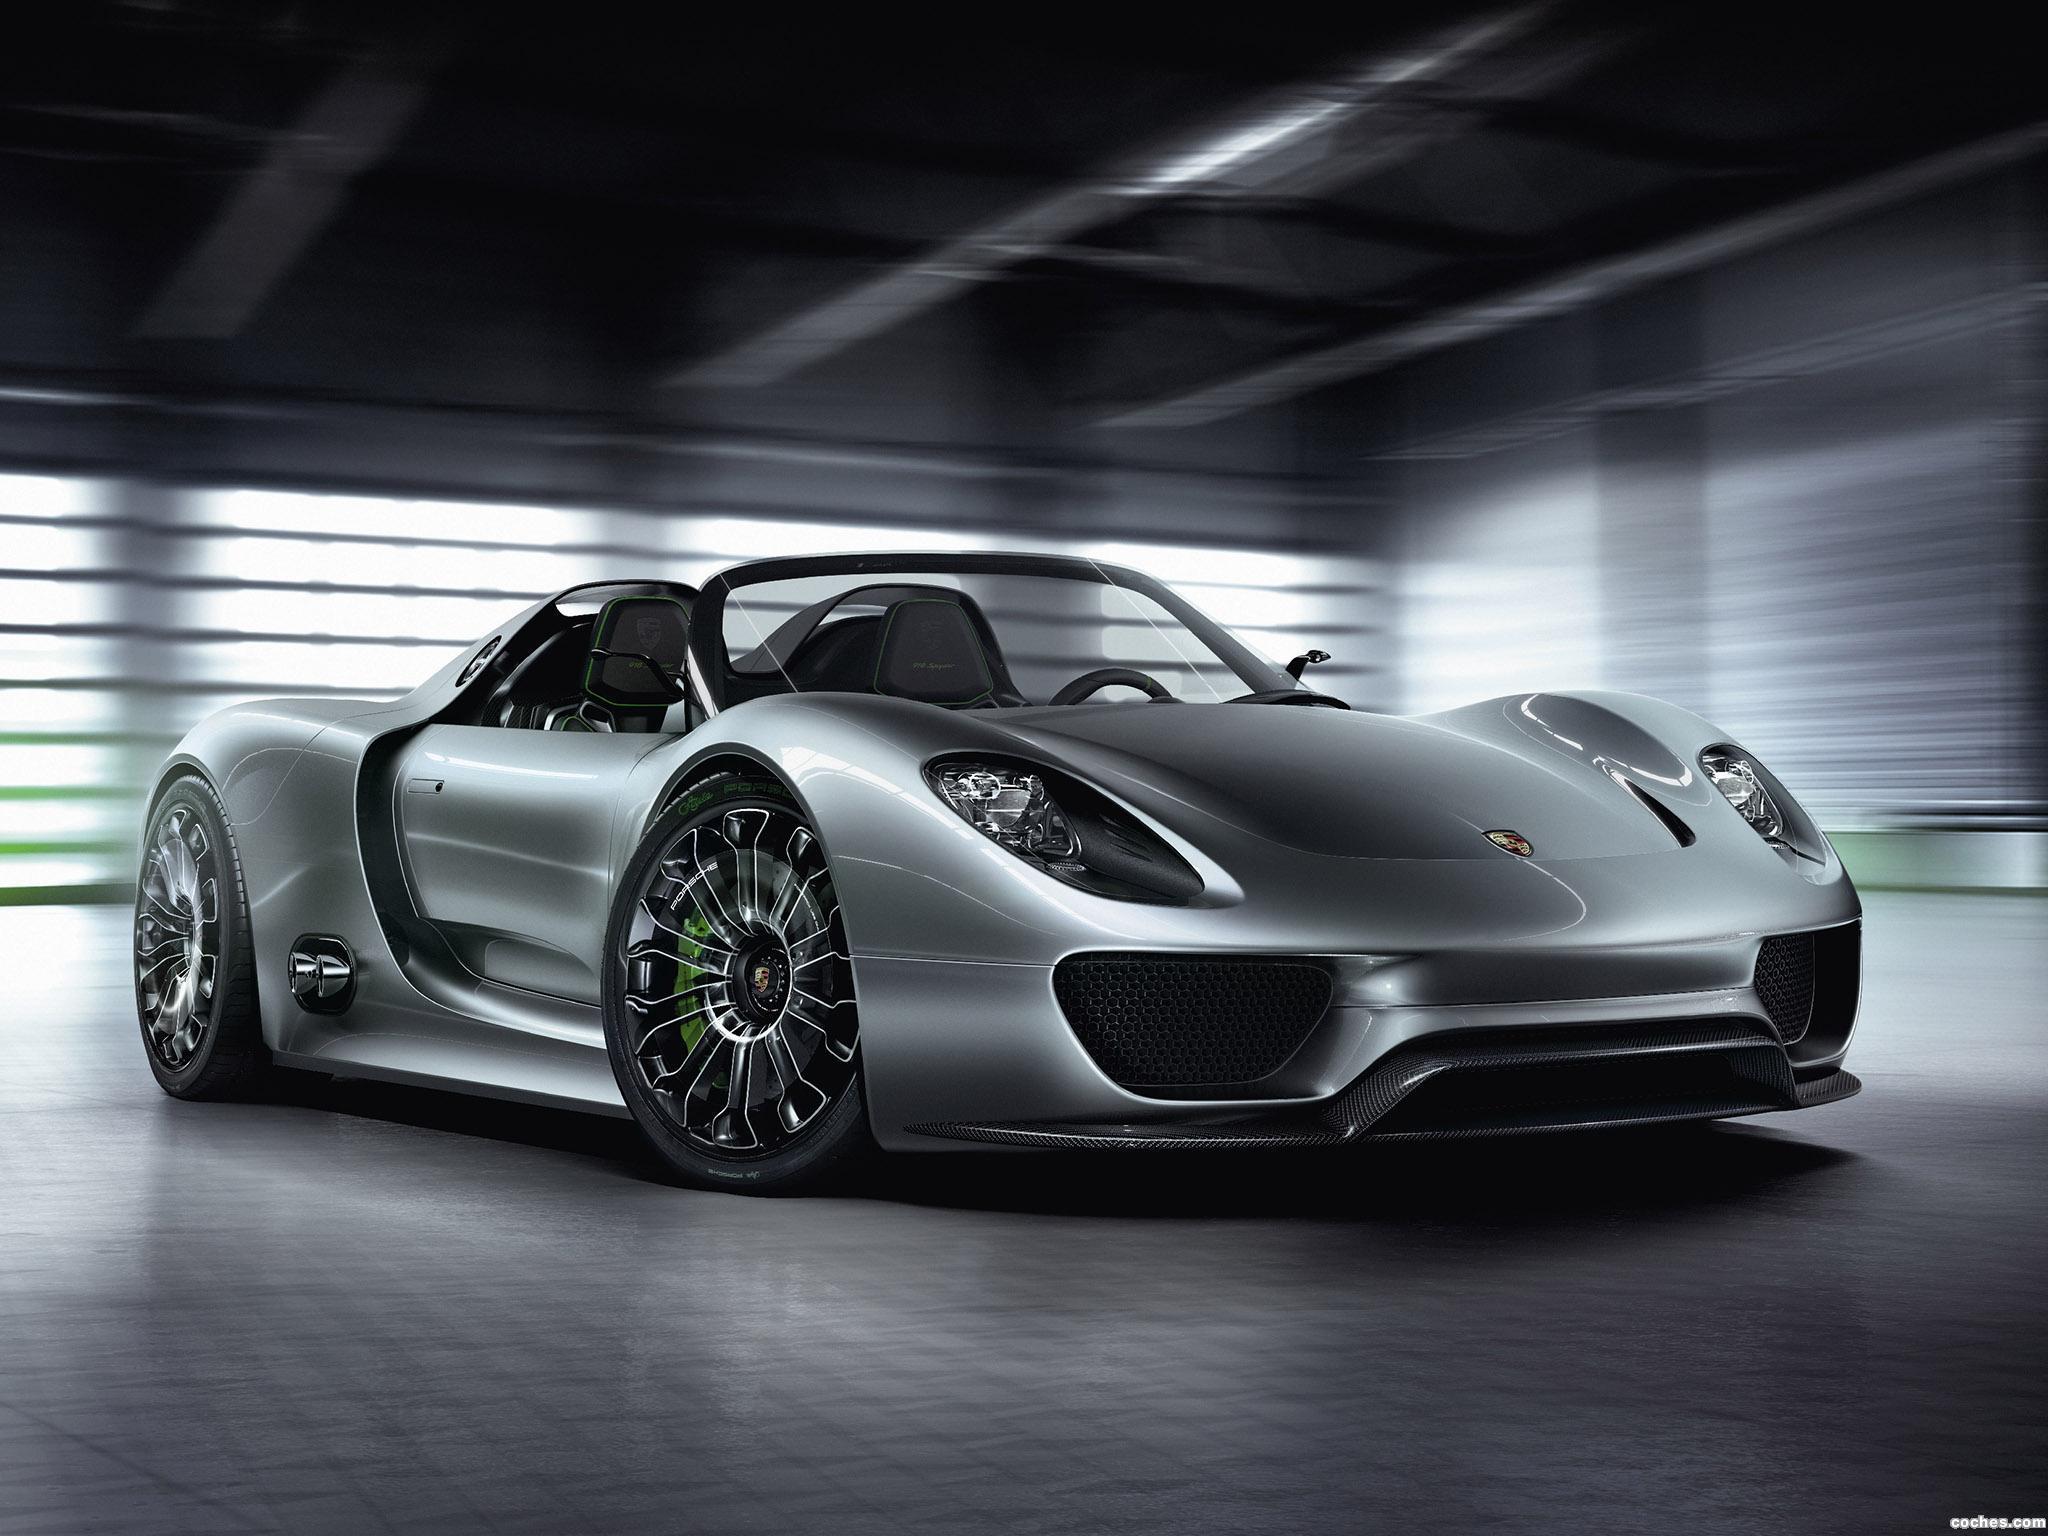 Foto 0 de Porsche Spyder Concept 2010